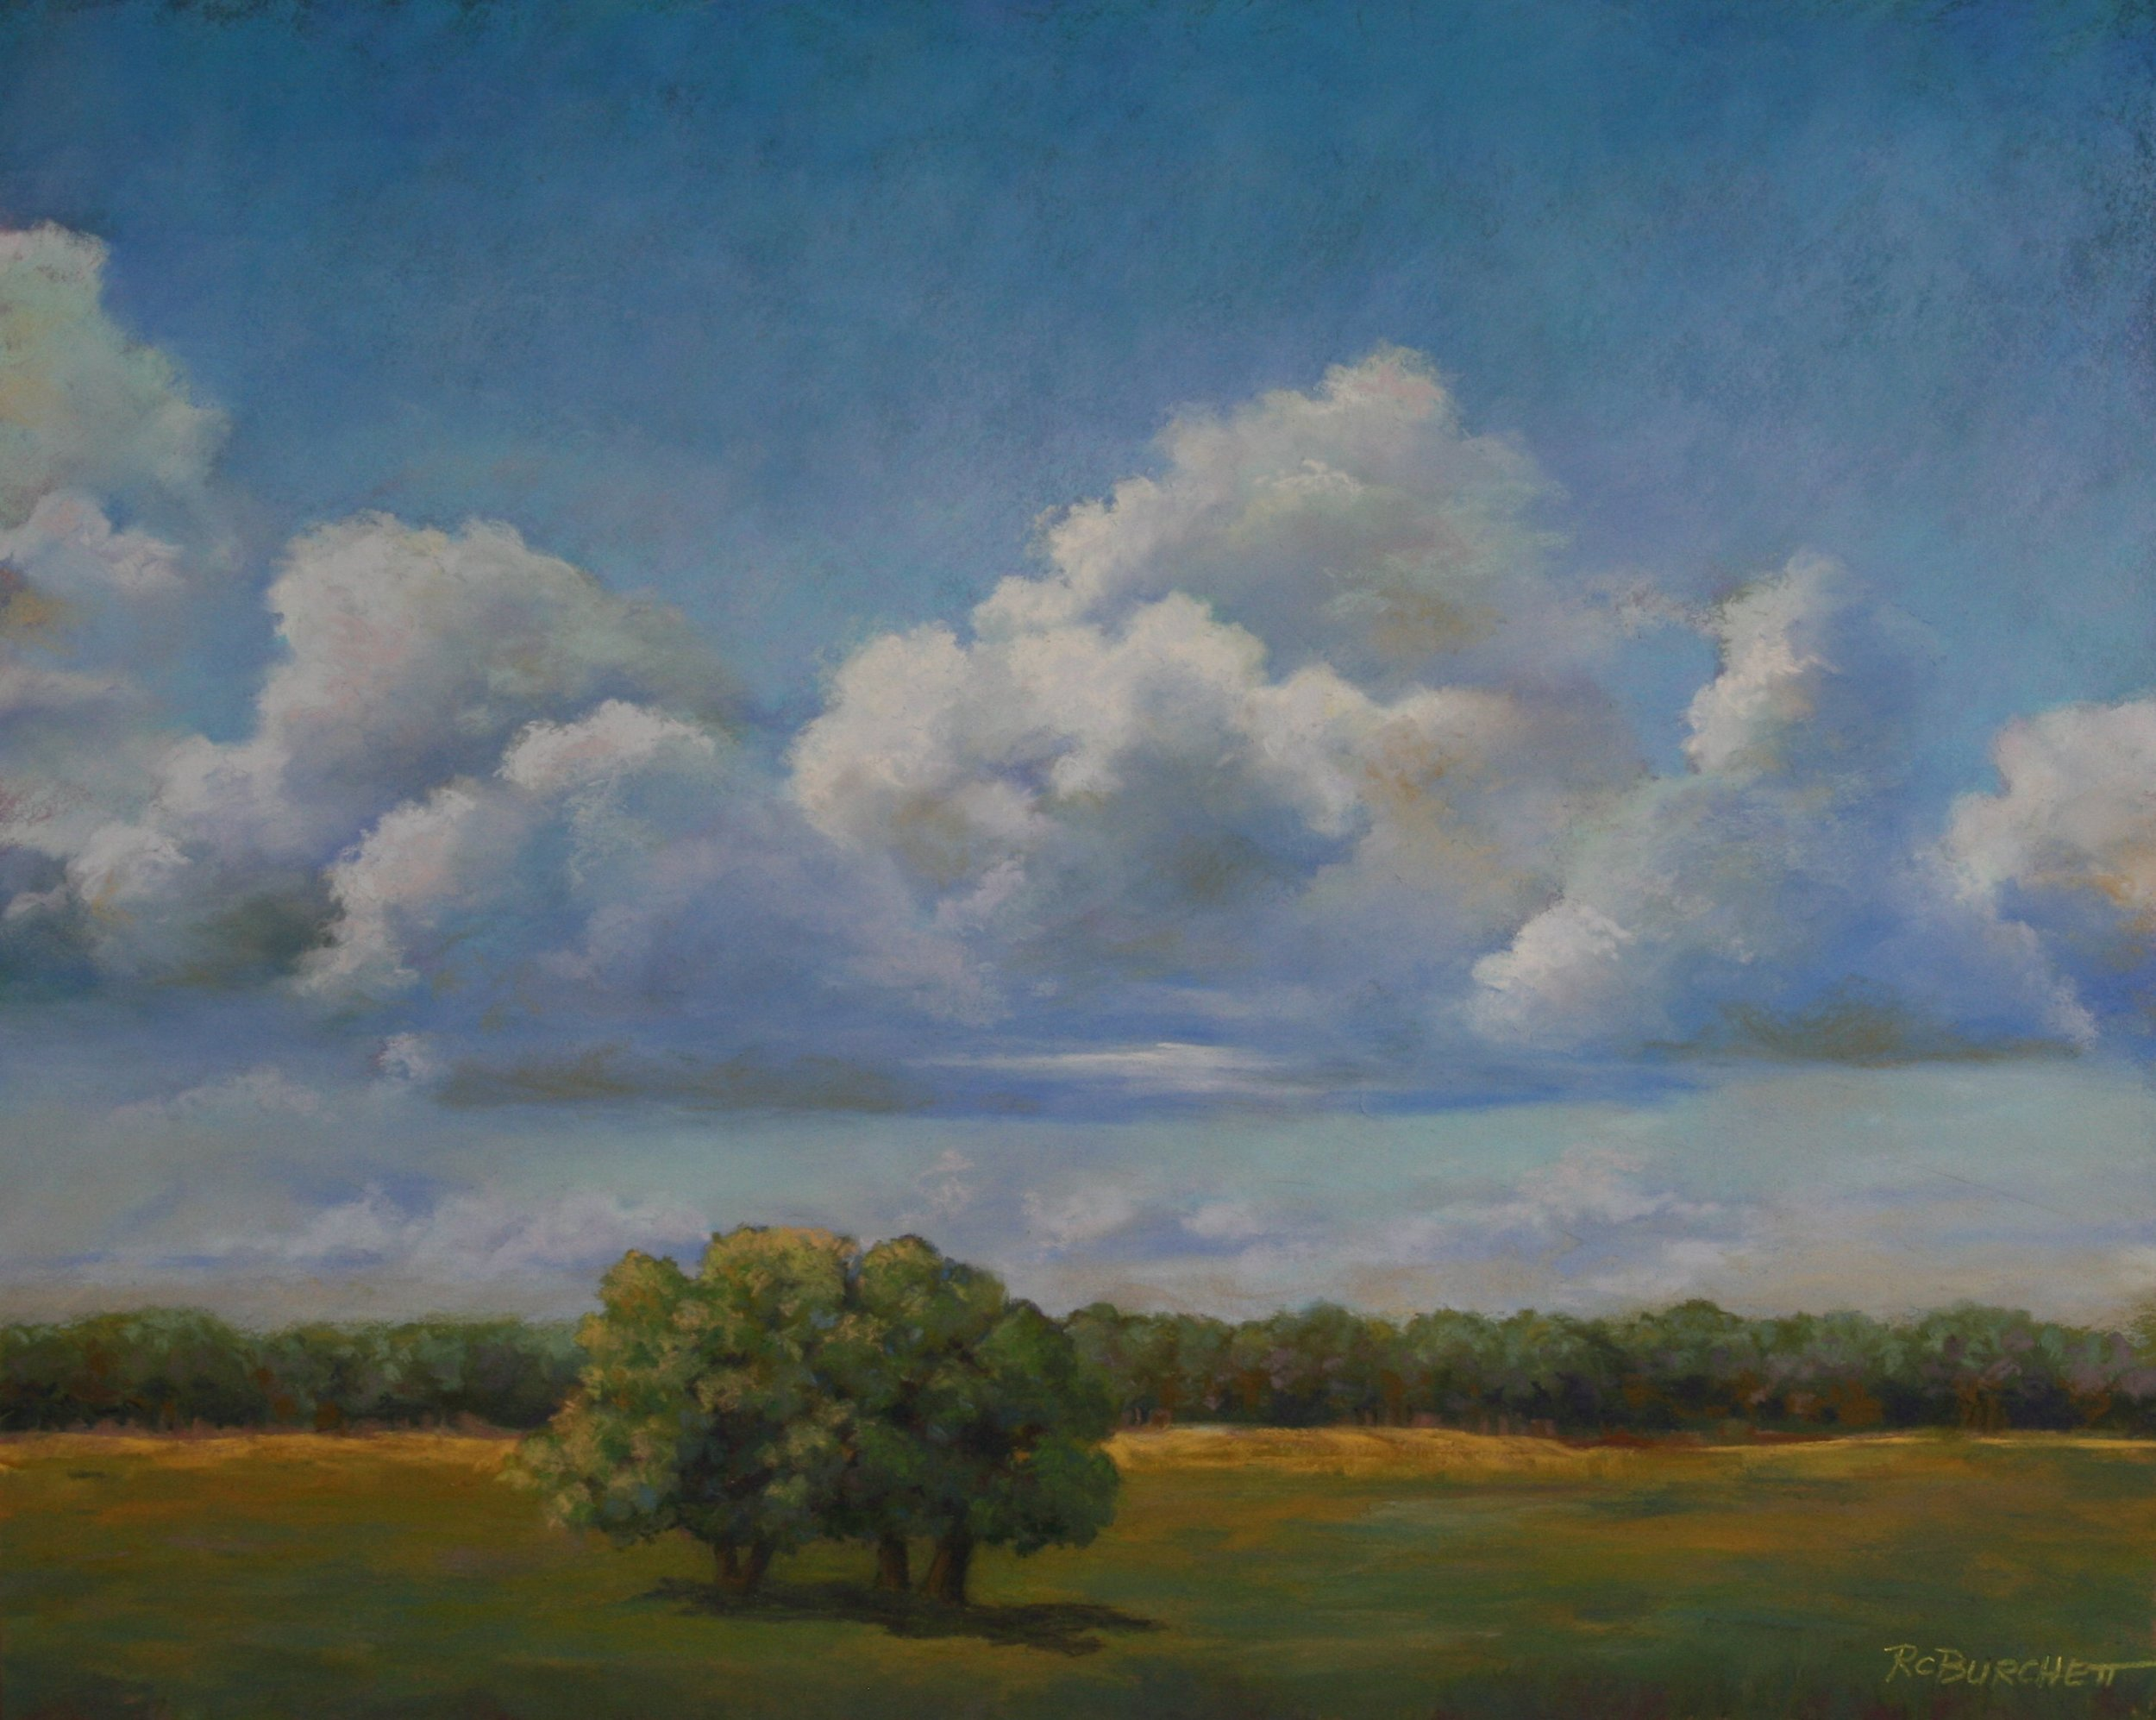 Kerrville Clouds